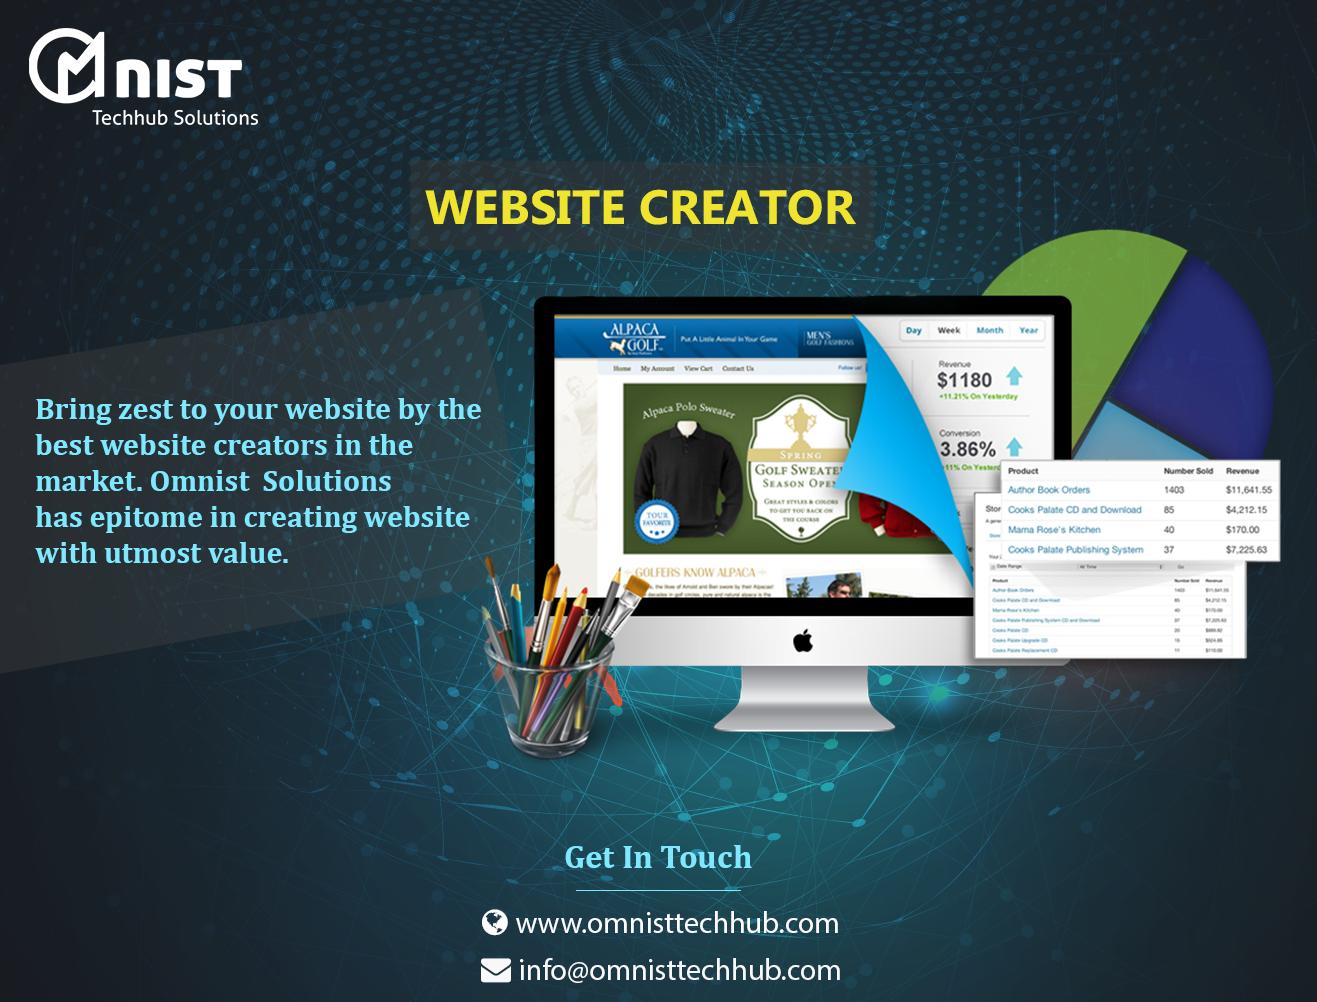 Bring zest to your website by the best, website creators